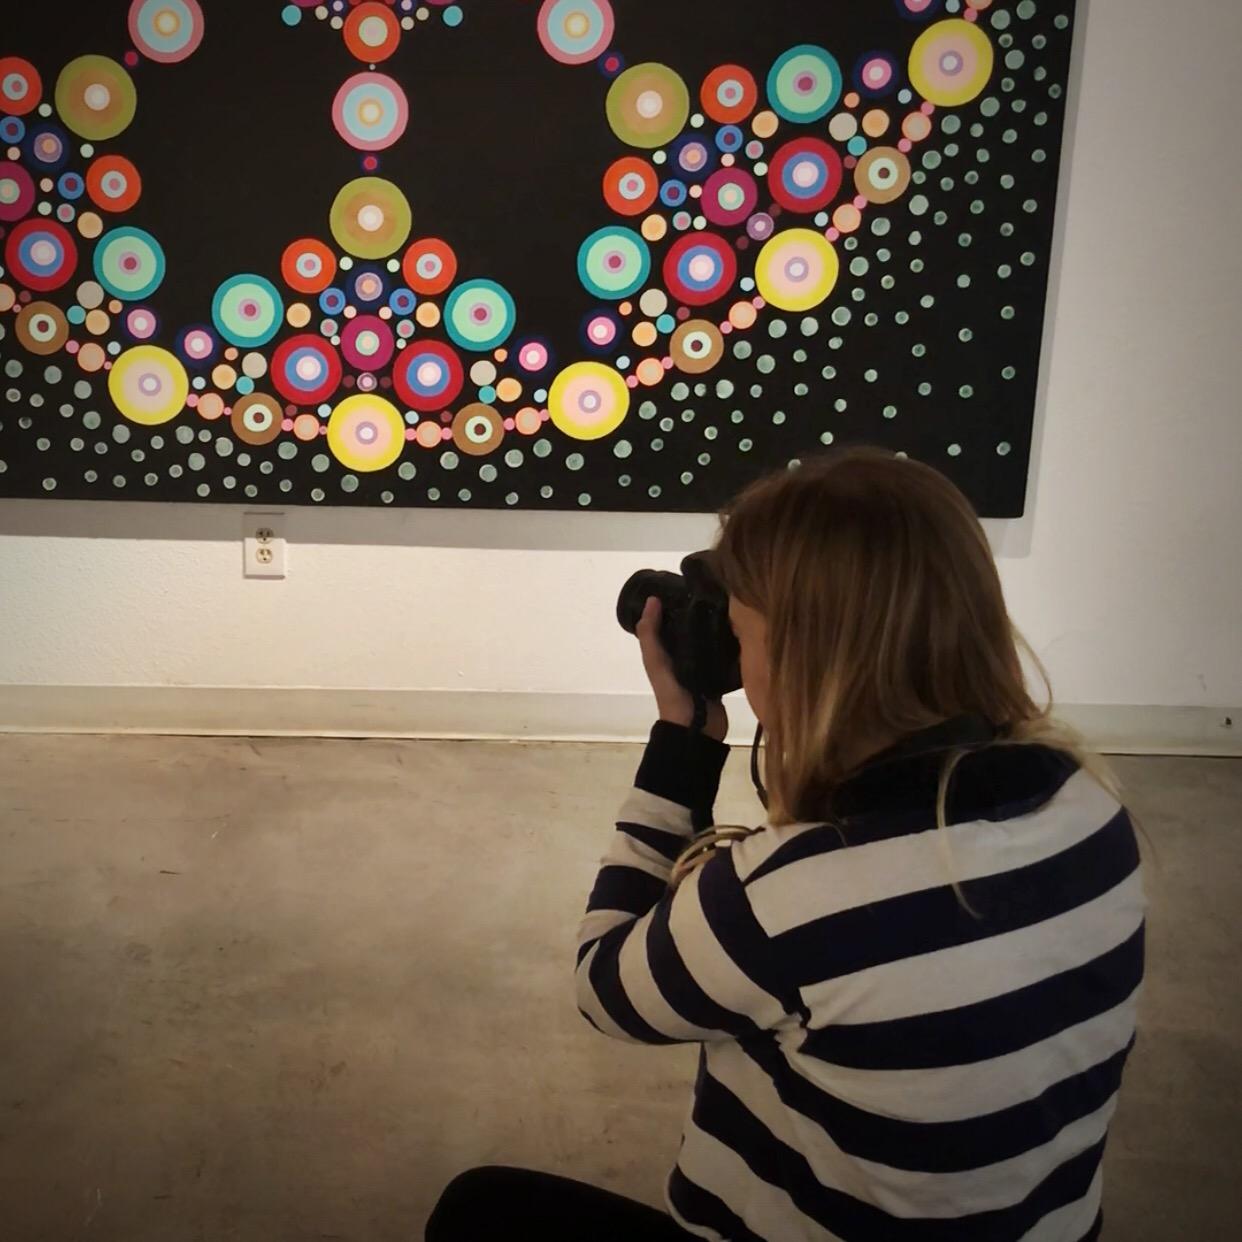 Digital Arts, Photo & Film -